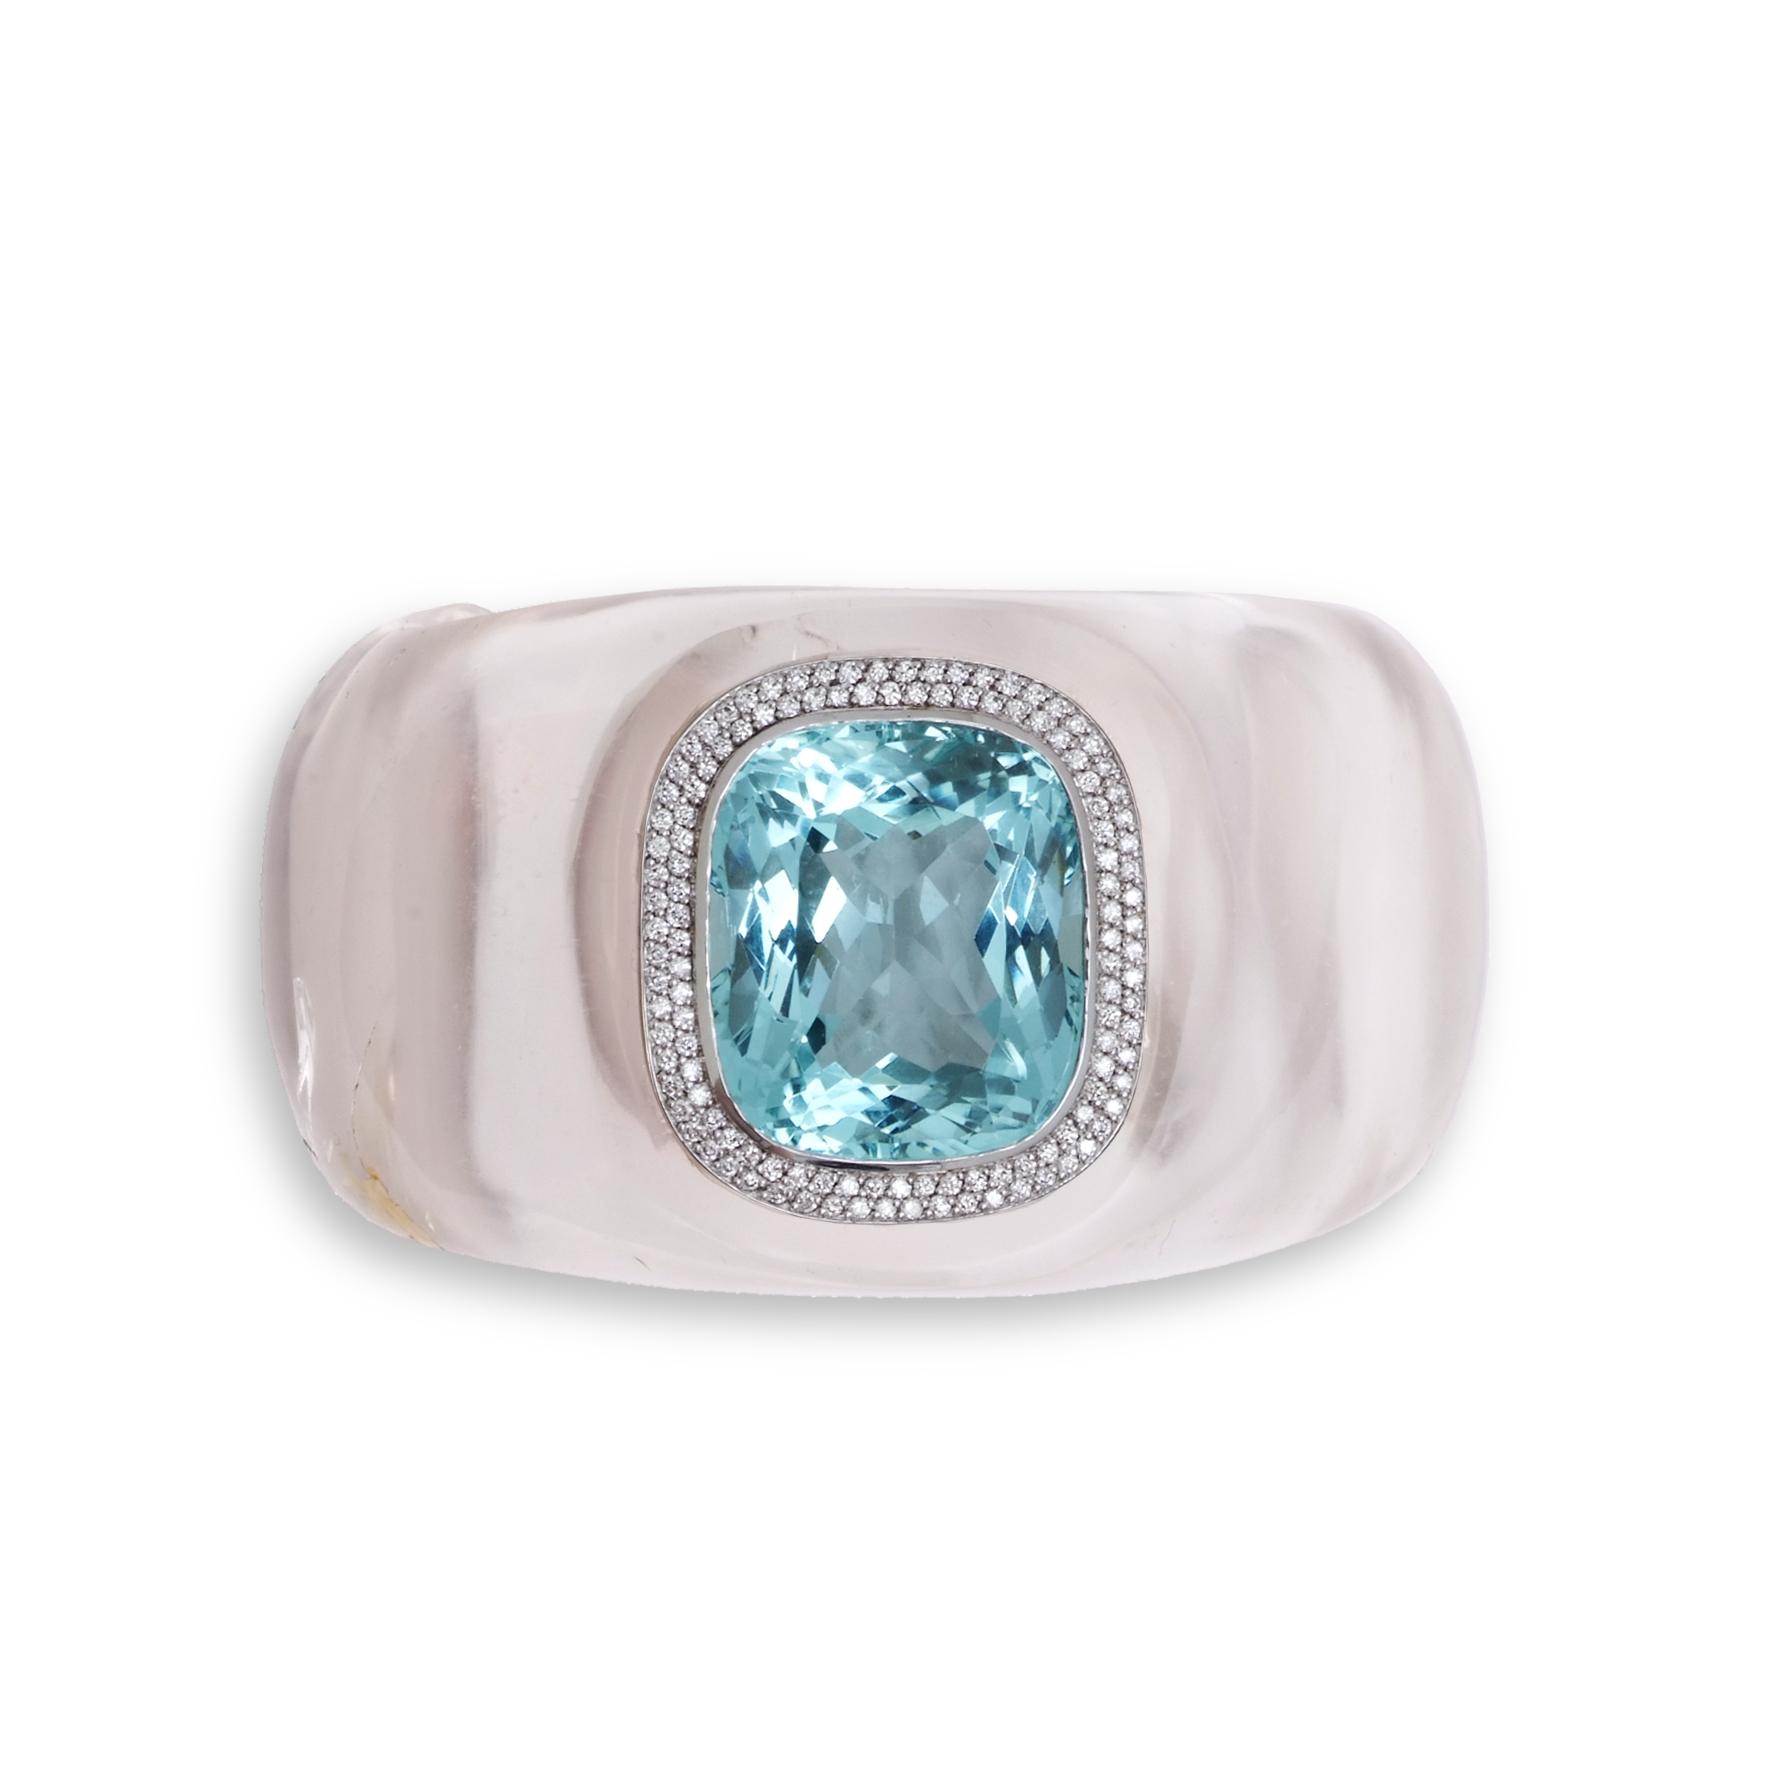 Rock-crystal-and-aquamarine-cuff-bangle.jpg